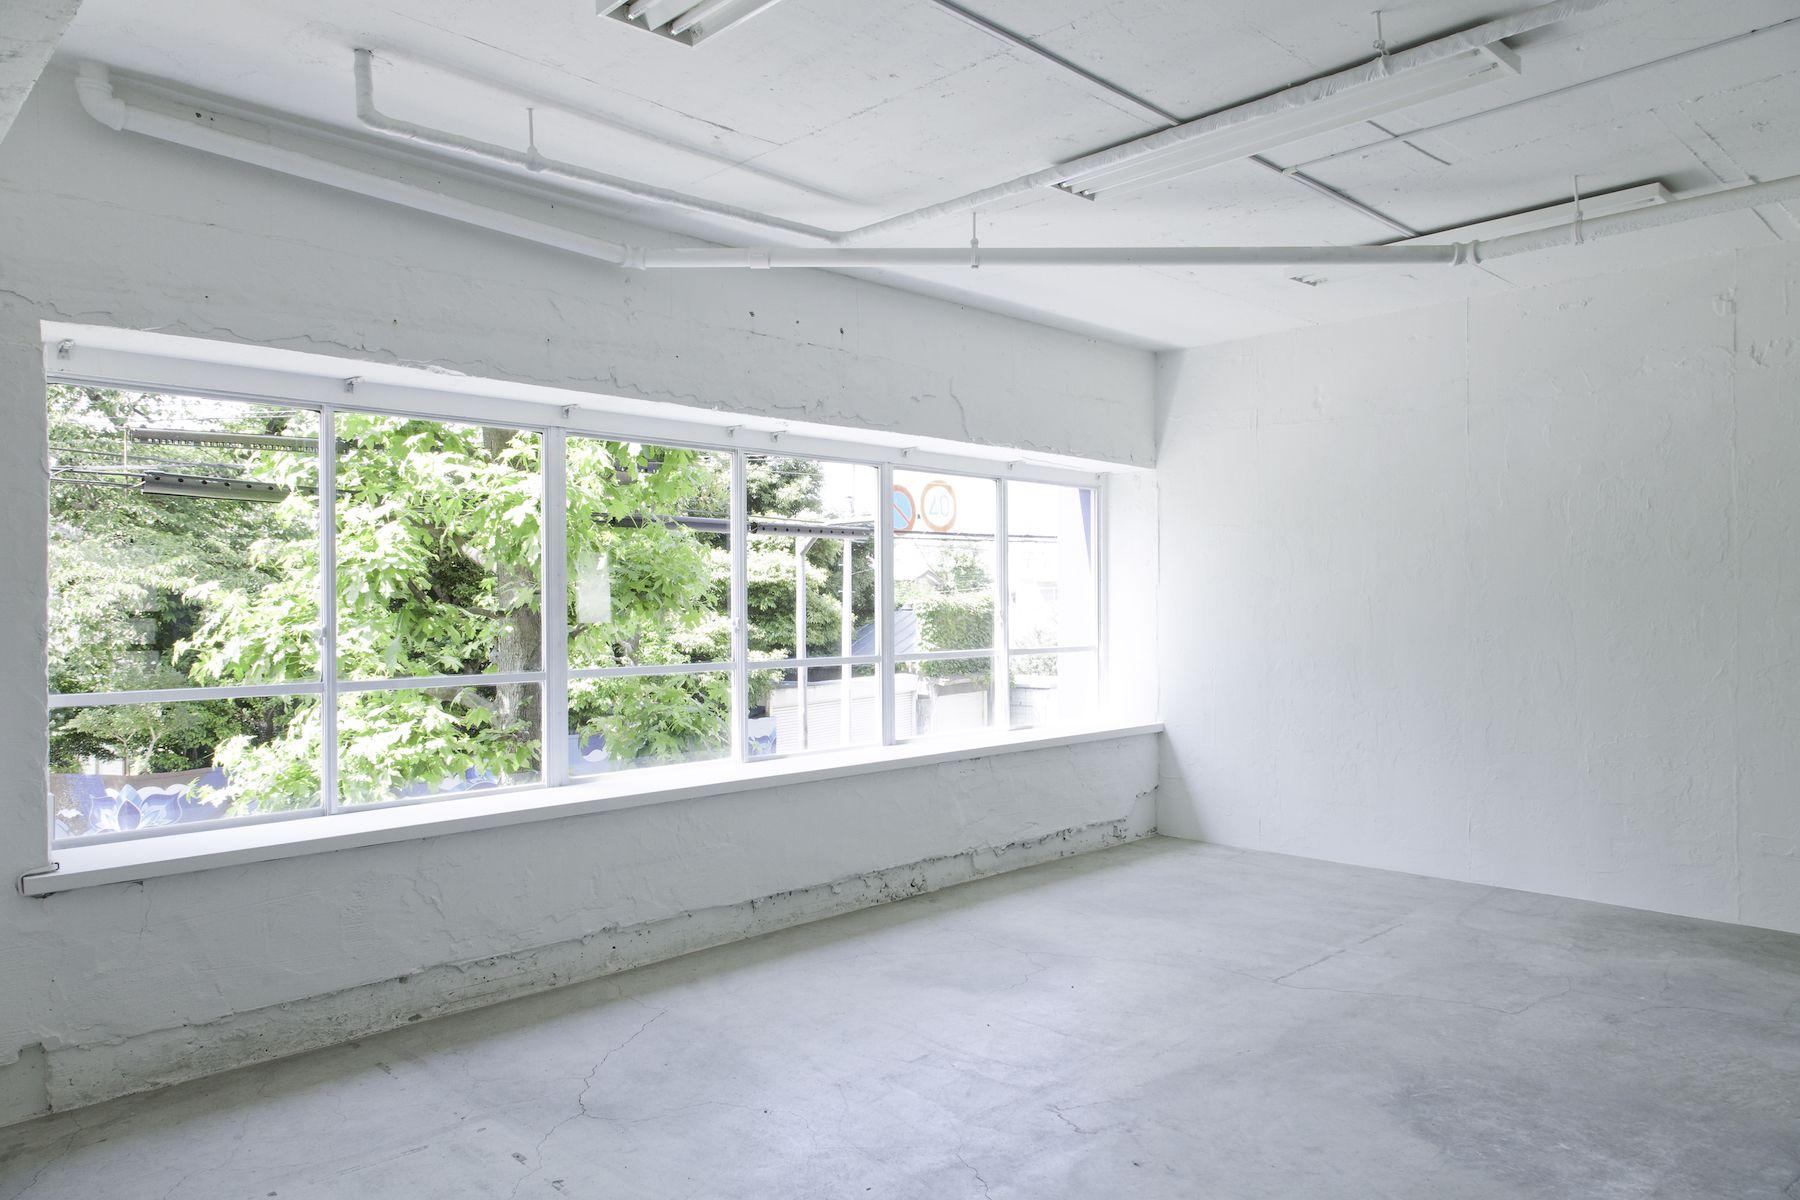 LEERES STUDIO (リアレススタジオ)大きな窓と白い壁/2F